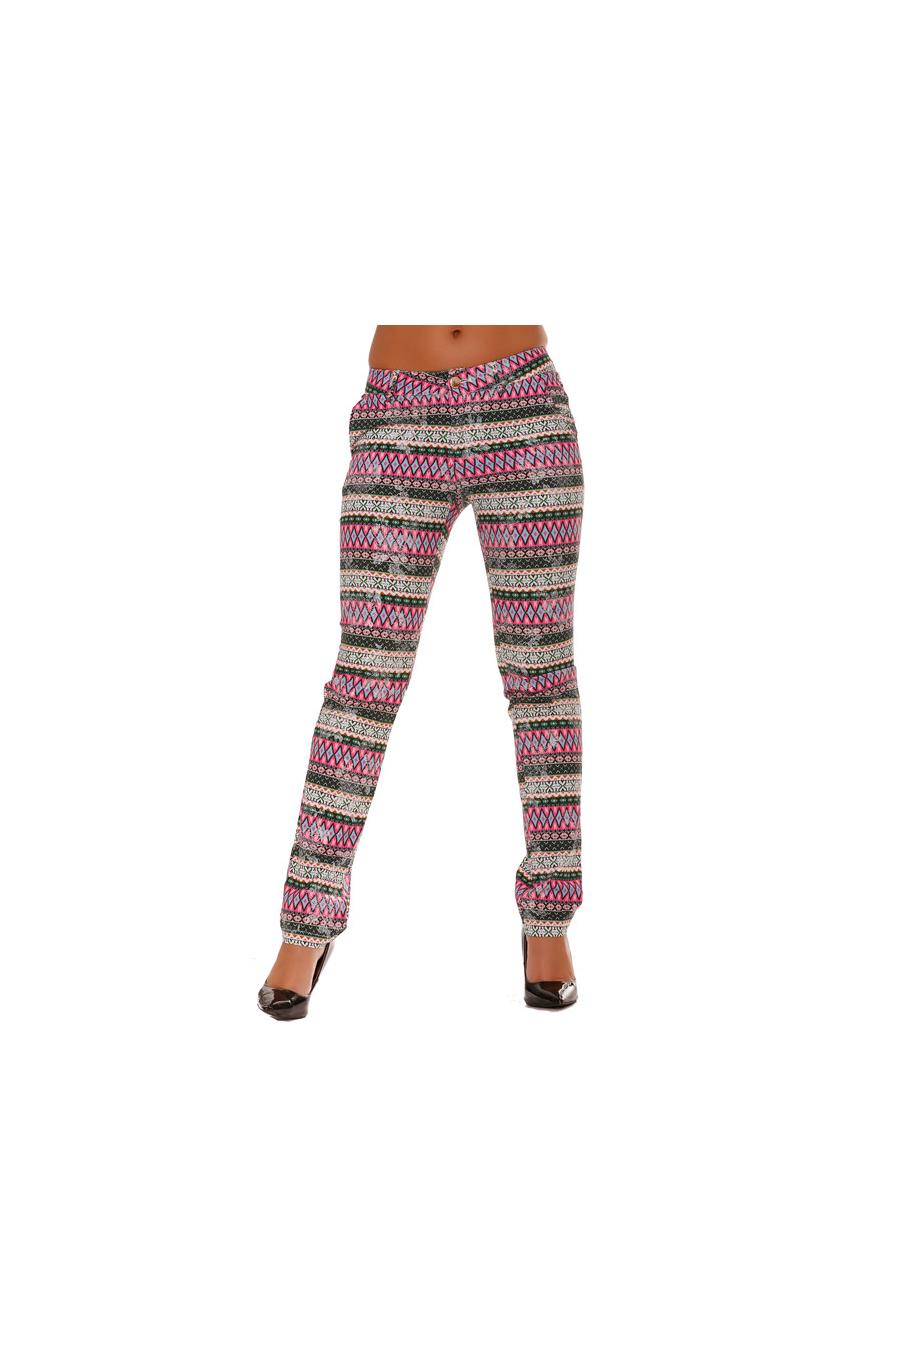 Pantalon à dominance Fushia. Fluide à motifs Aztèques. Pantalon Femme. 668